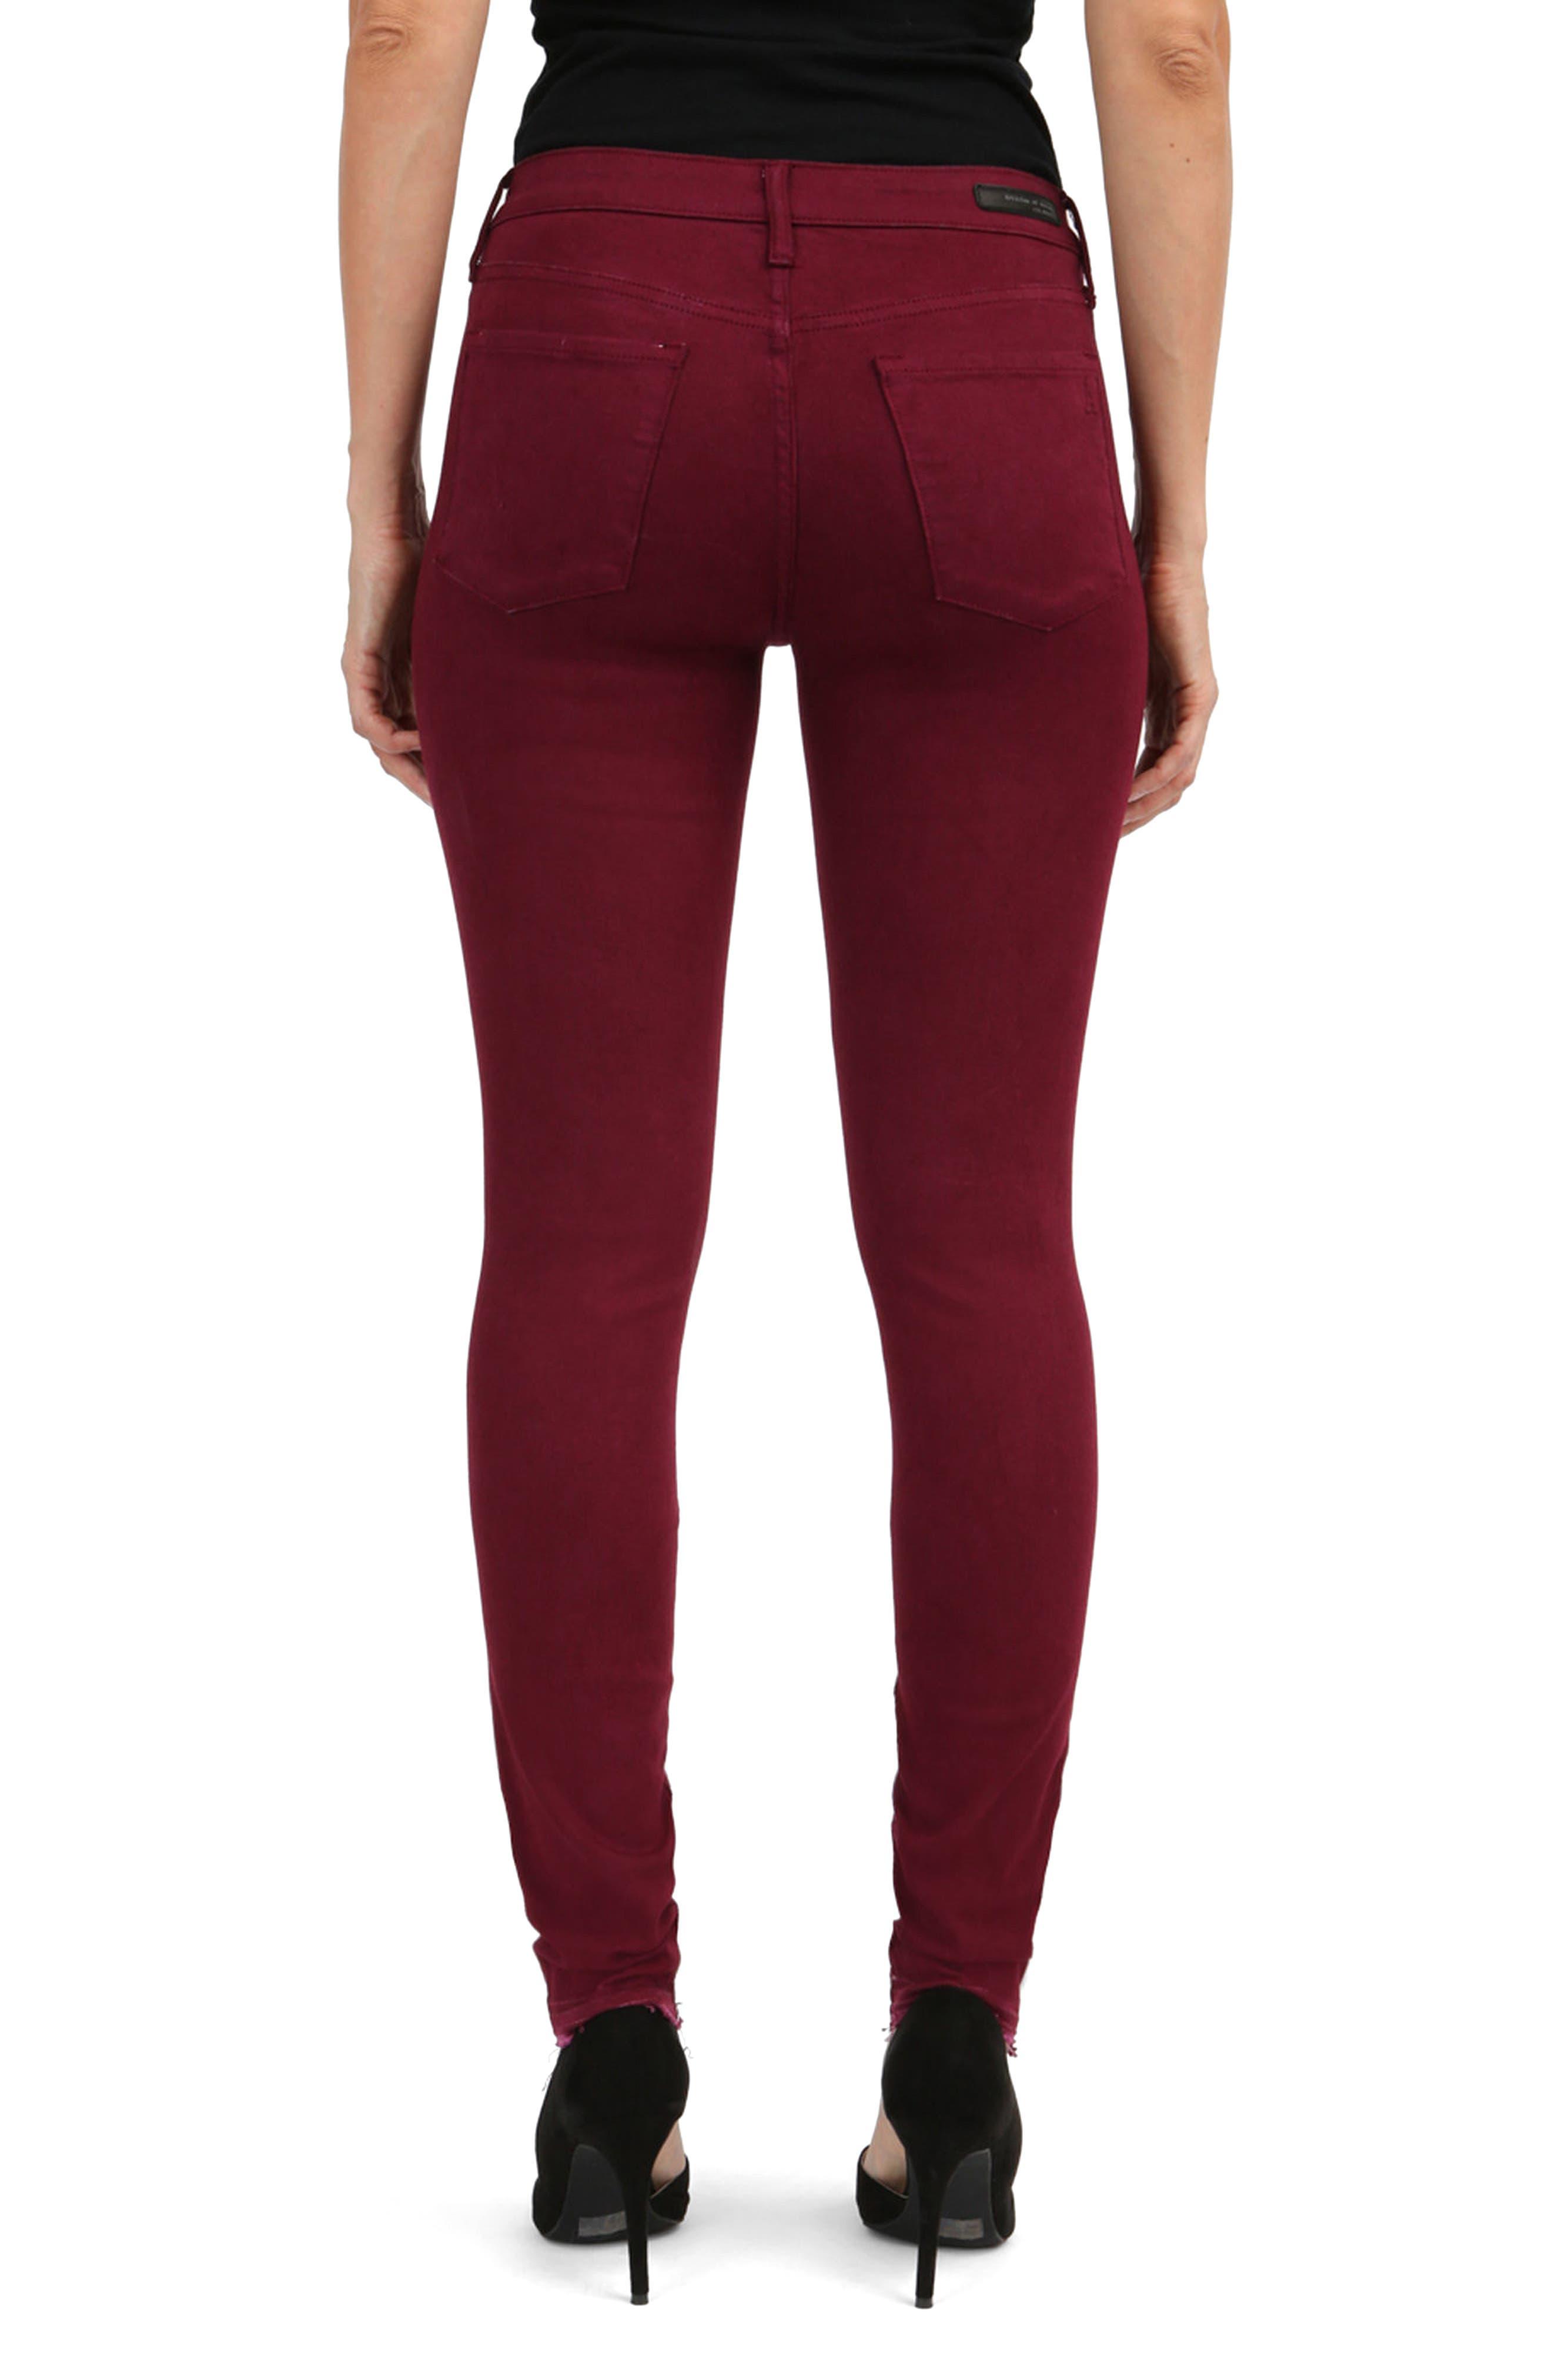 Sarah Release Hem Skinny Jeans,                             Alternate thumbnail 2, color,                             616